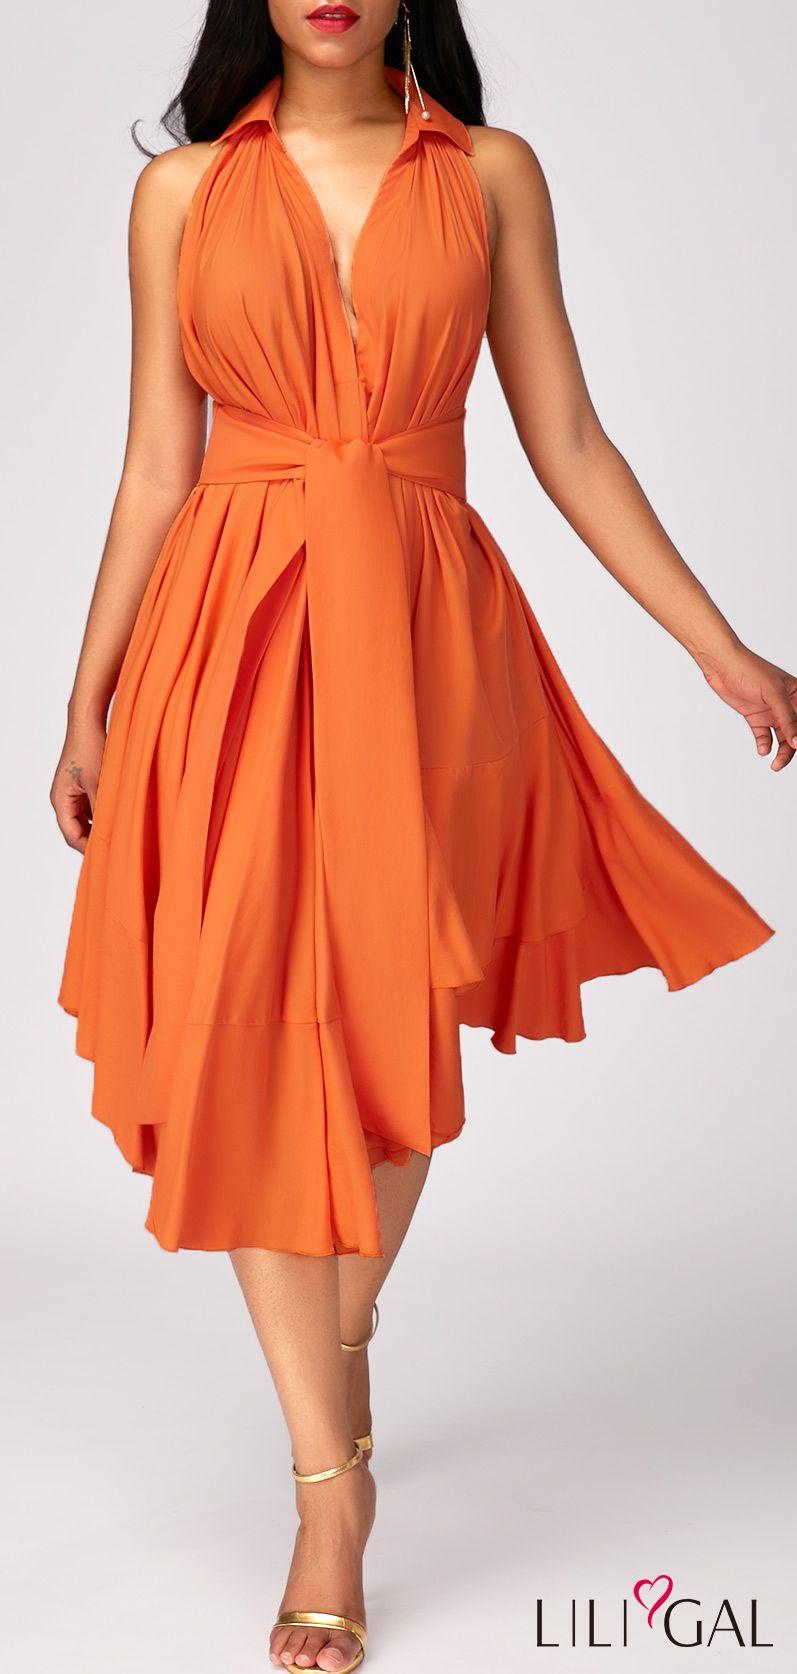 Orange dress casual  Orange High Waist Asymmetric Hem Layered Dress  Layering Clothes